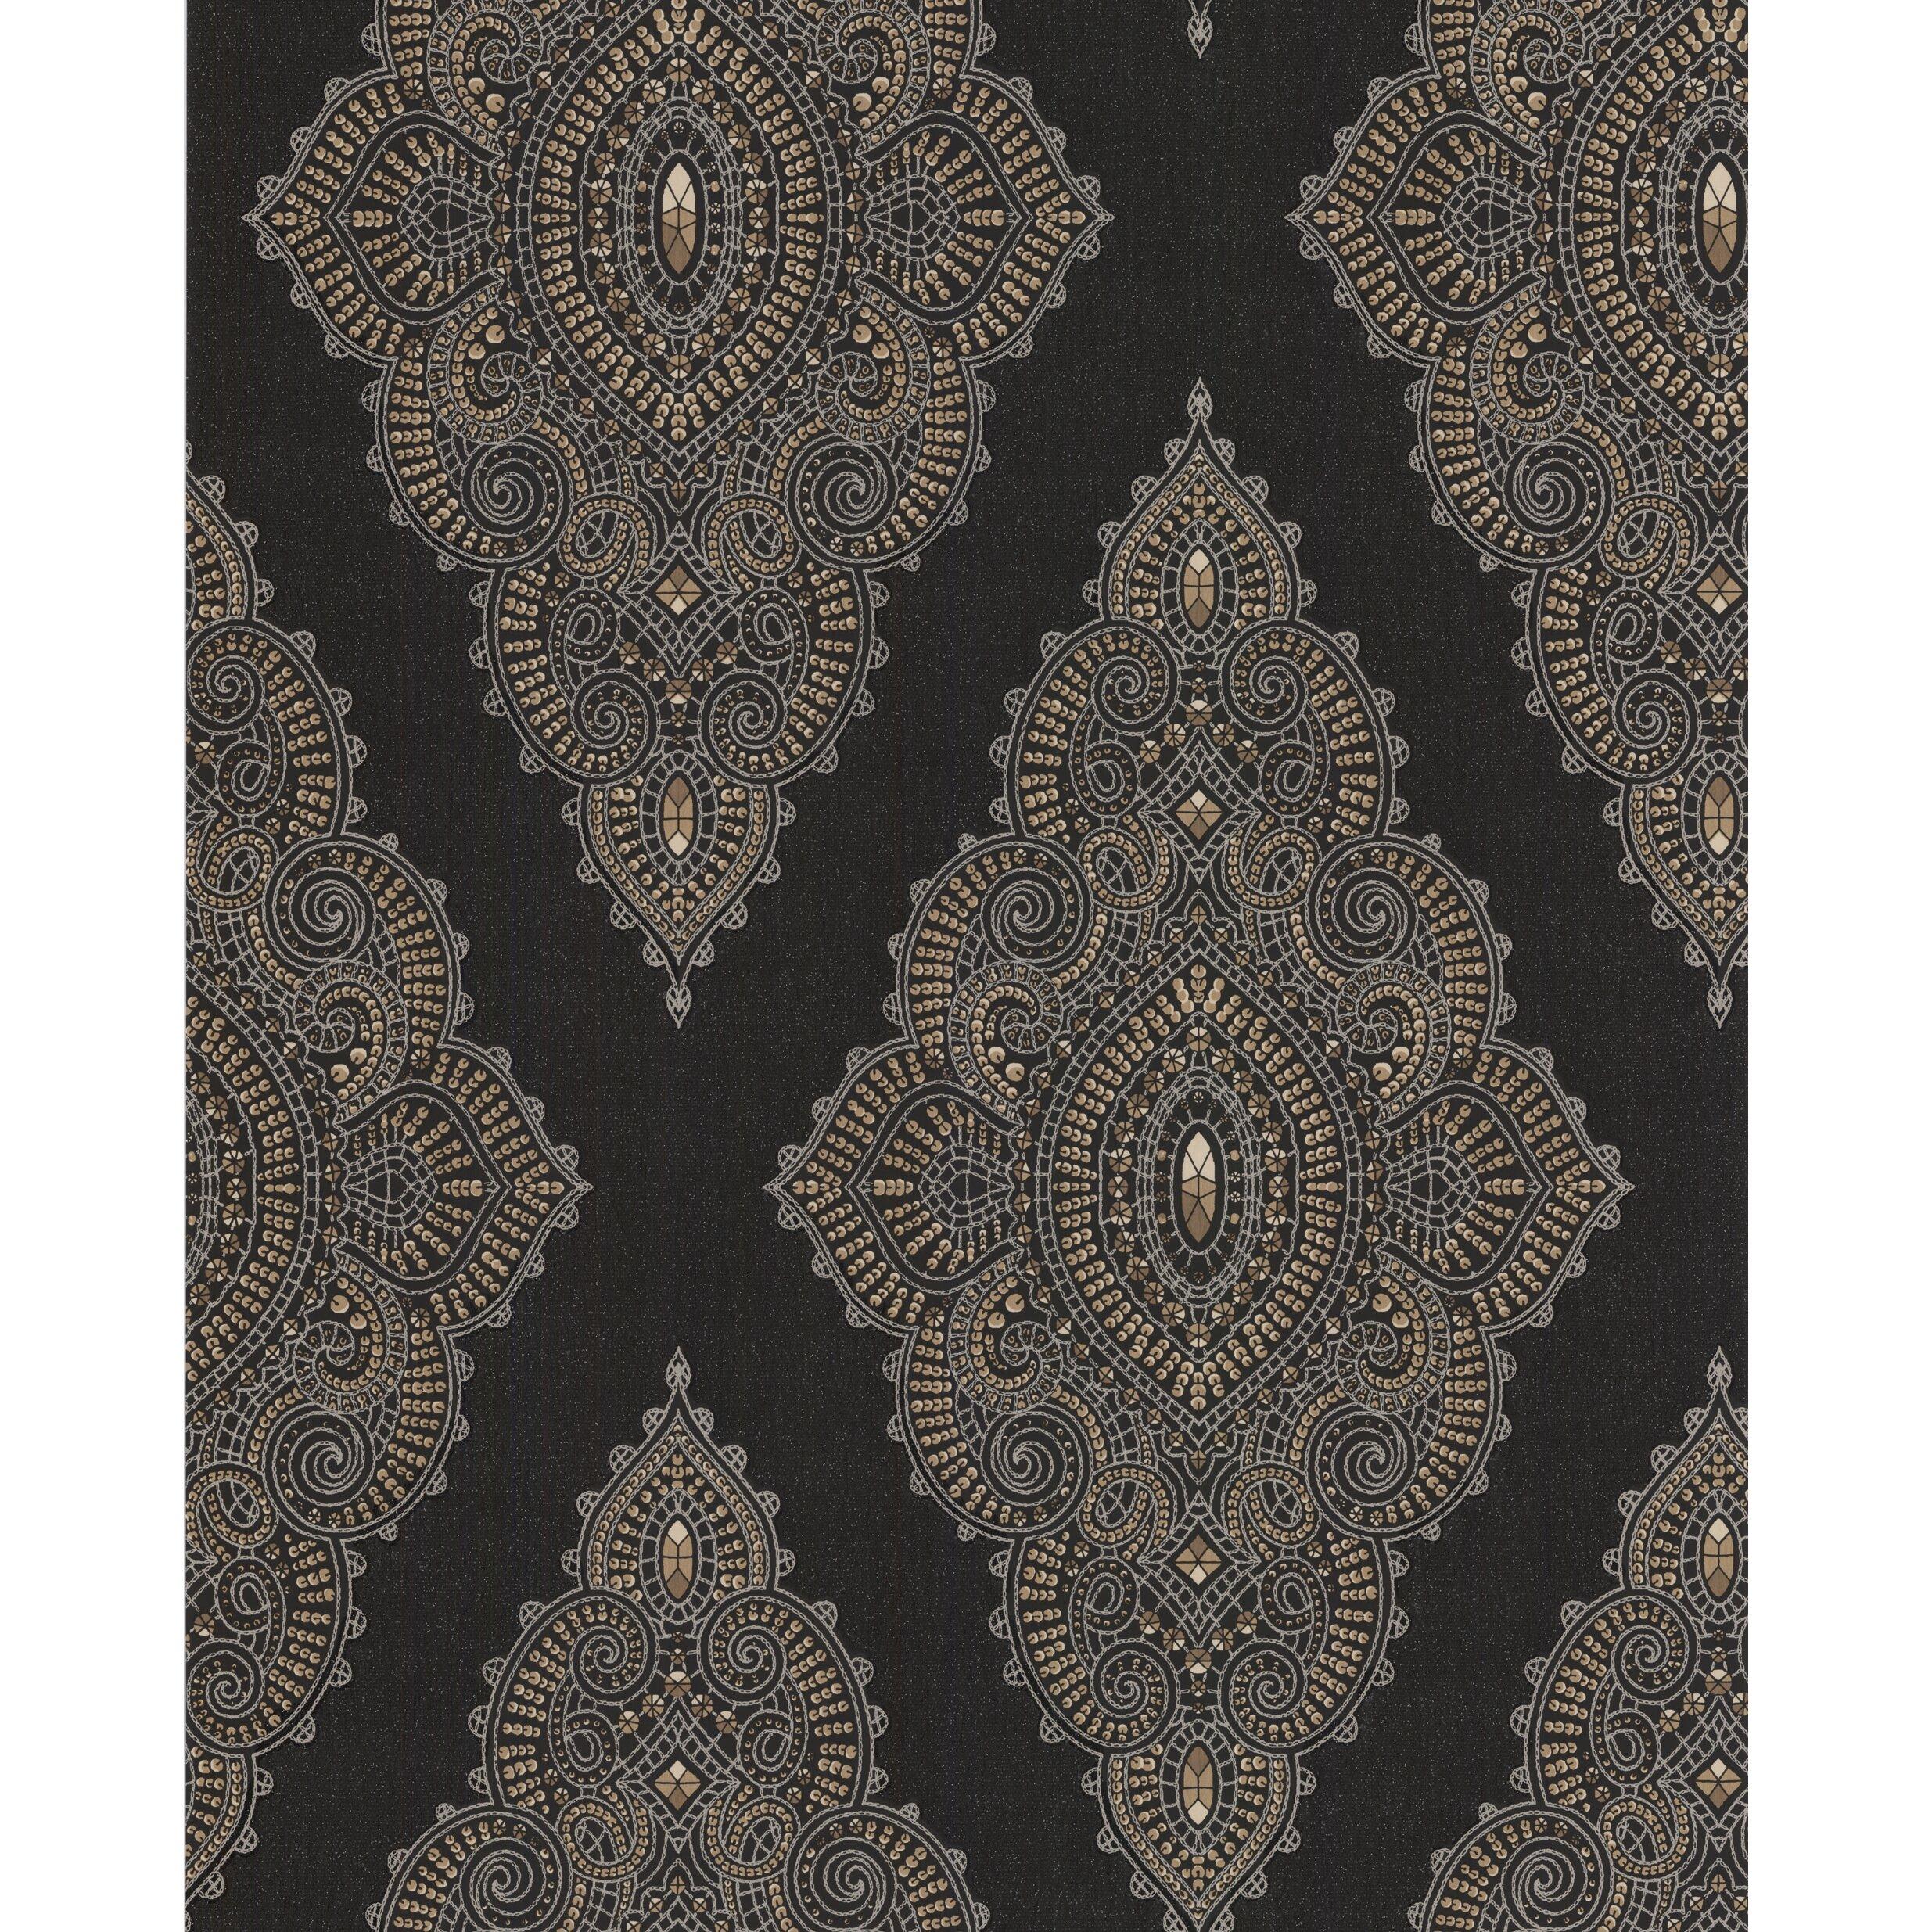 graham brown julien macdonald 10m l x 52cm w roll. Black Bedroom Furniture Sets. Home Design Ideas